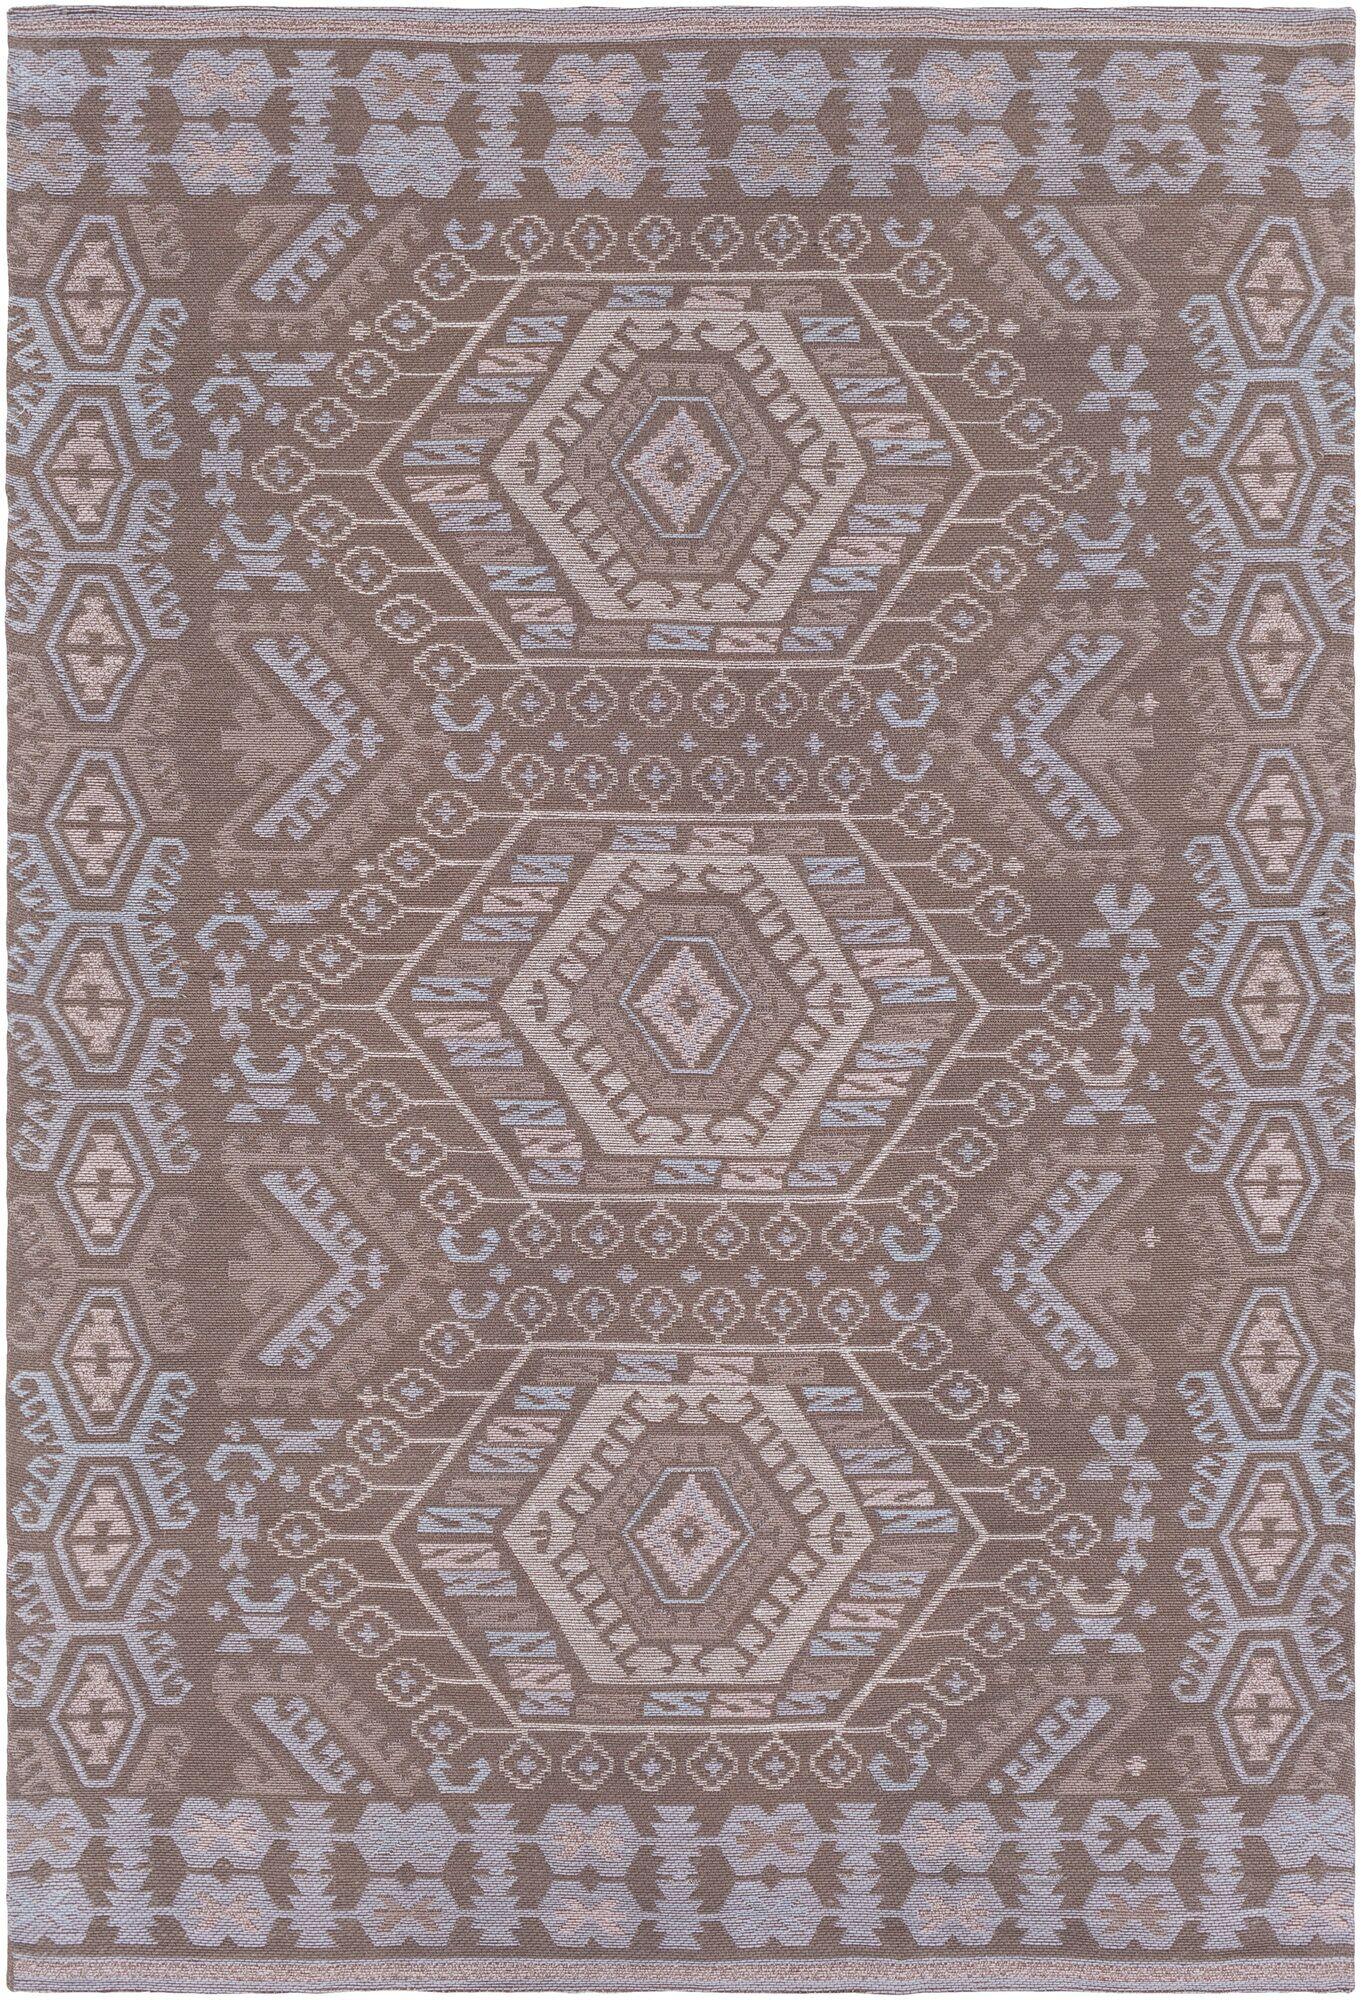 Sturbridge Hand Woven Brown Outdoor Area Rug Rug Size: Rectangle 4' x 6'